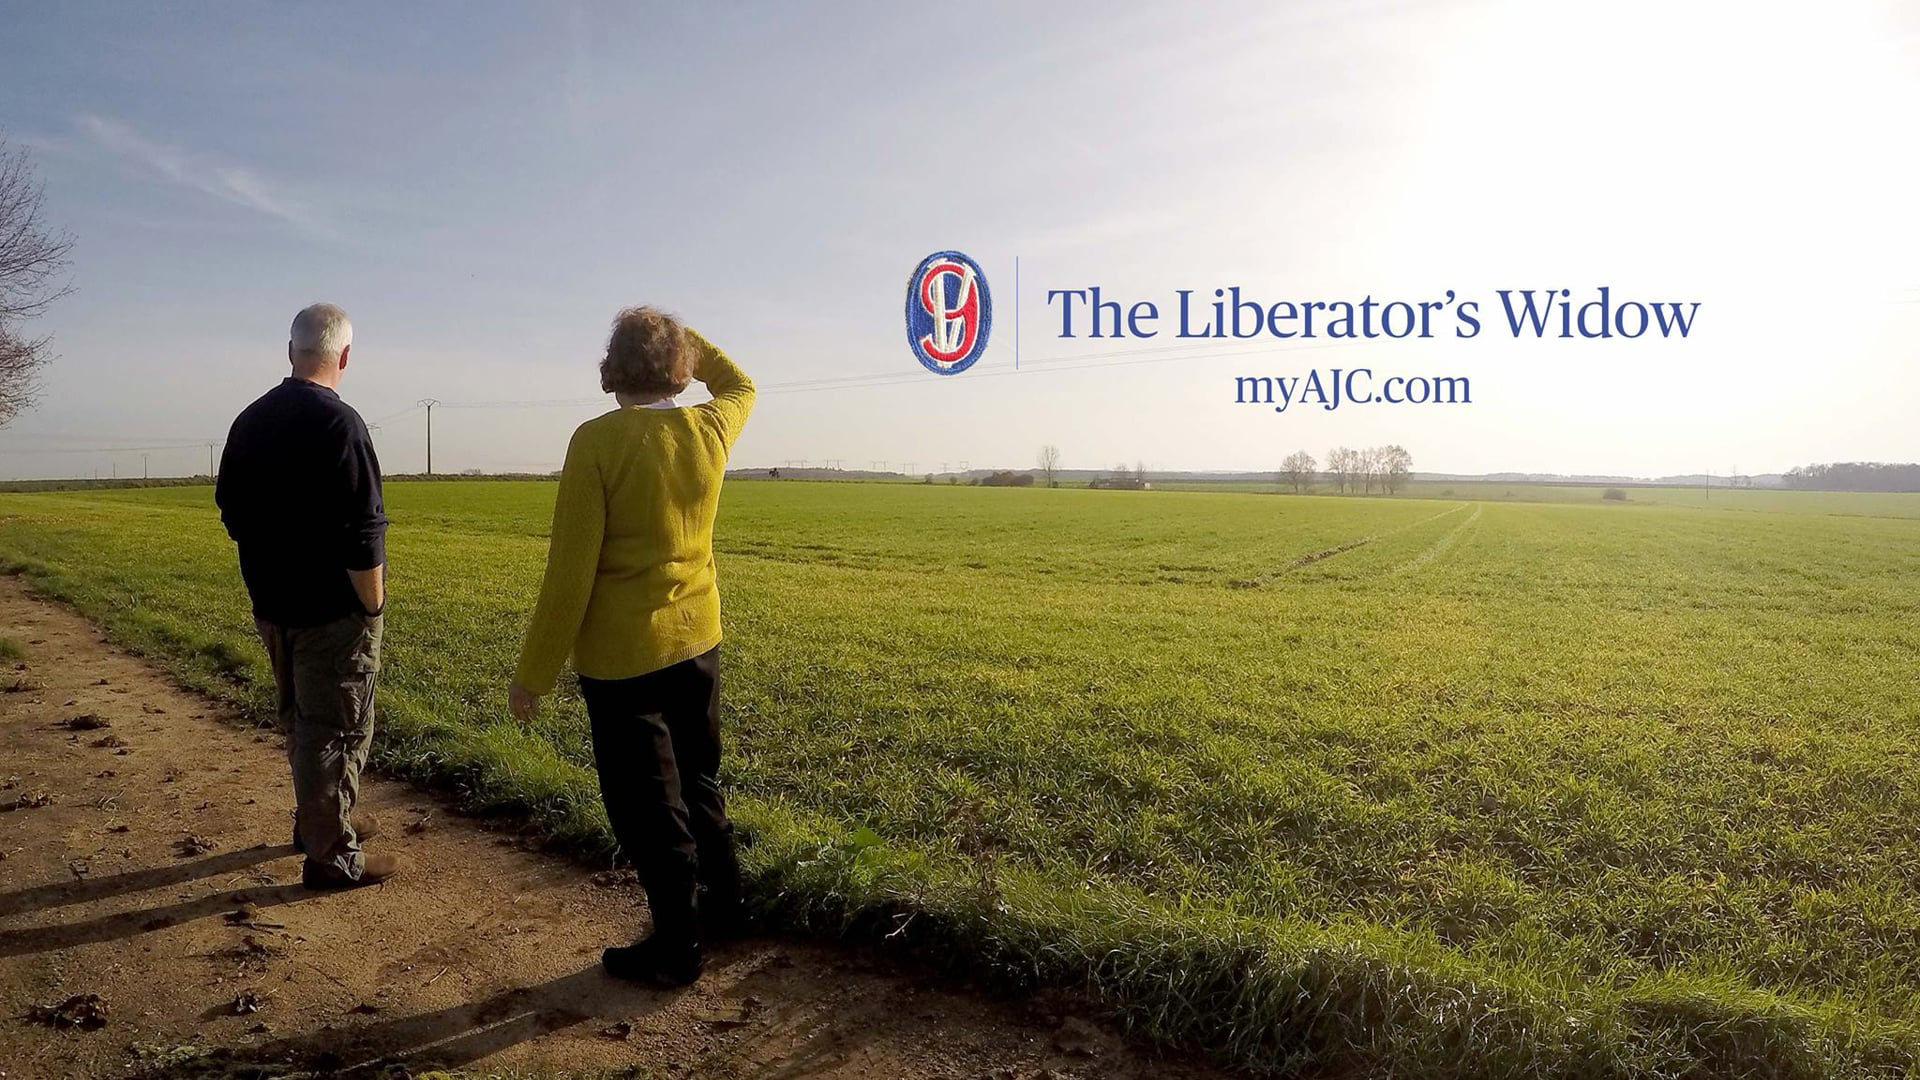 The Liberator's Widow